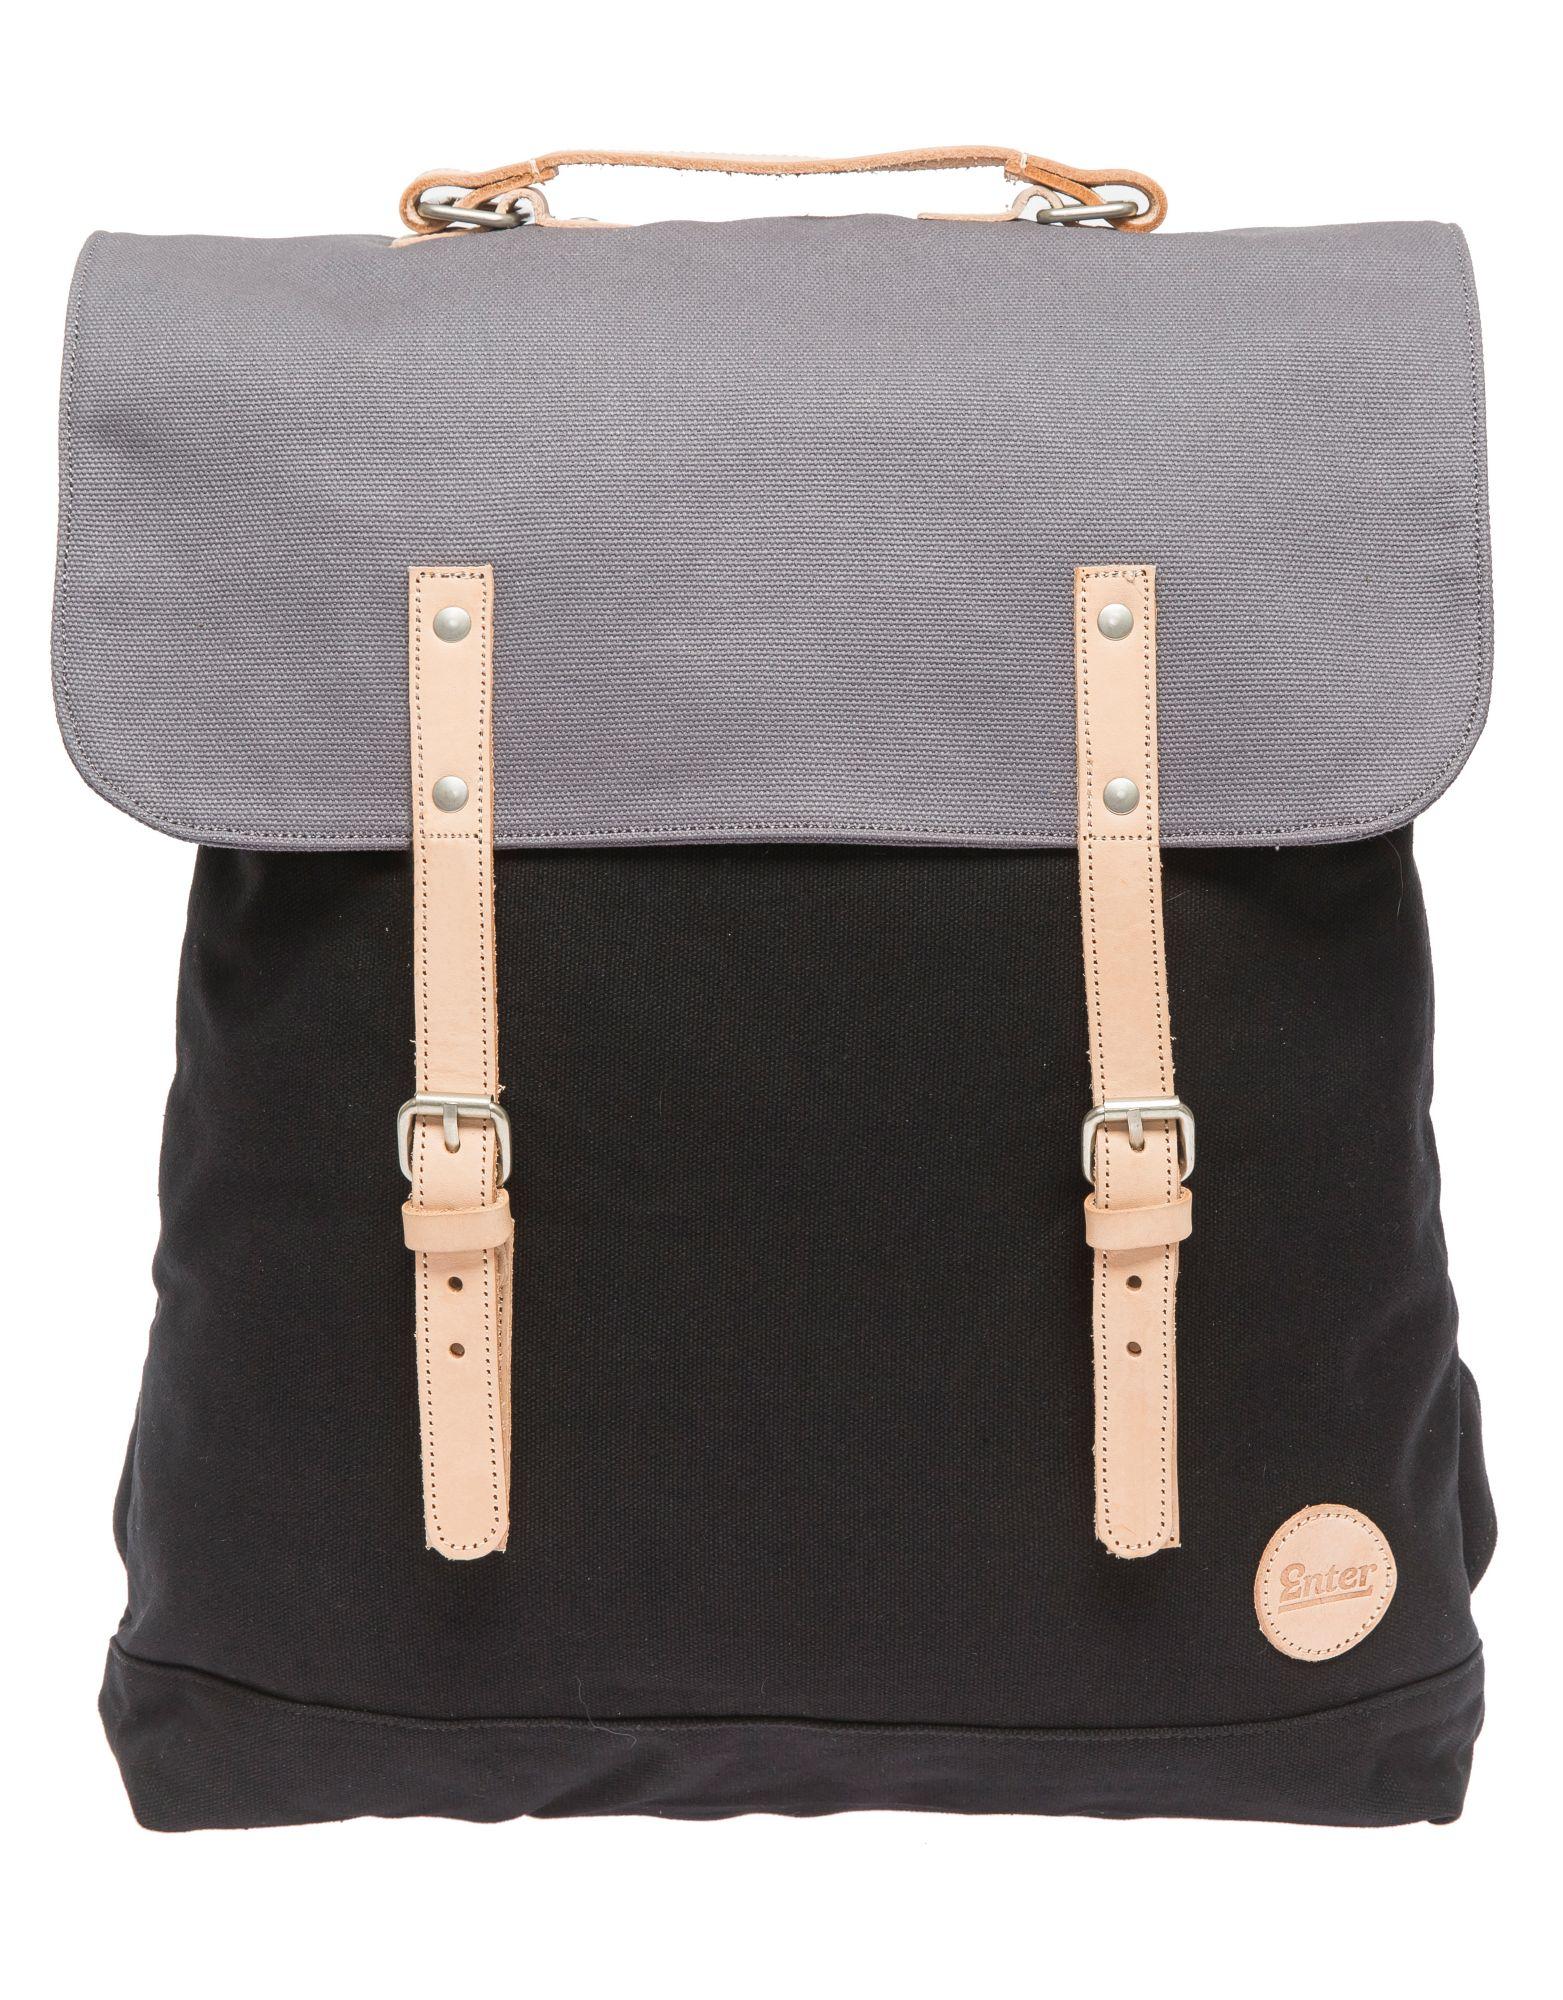 ENTER Enter Rucksack mit 17 Zoll Laptopfach, »Backpack, Black/Grey«